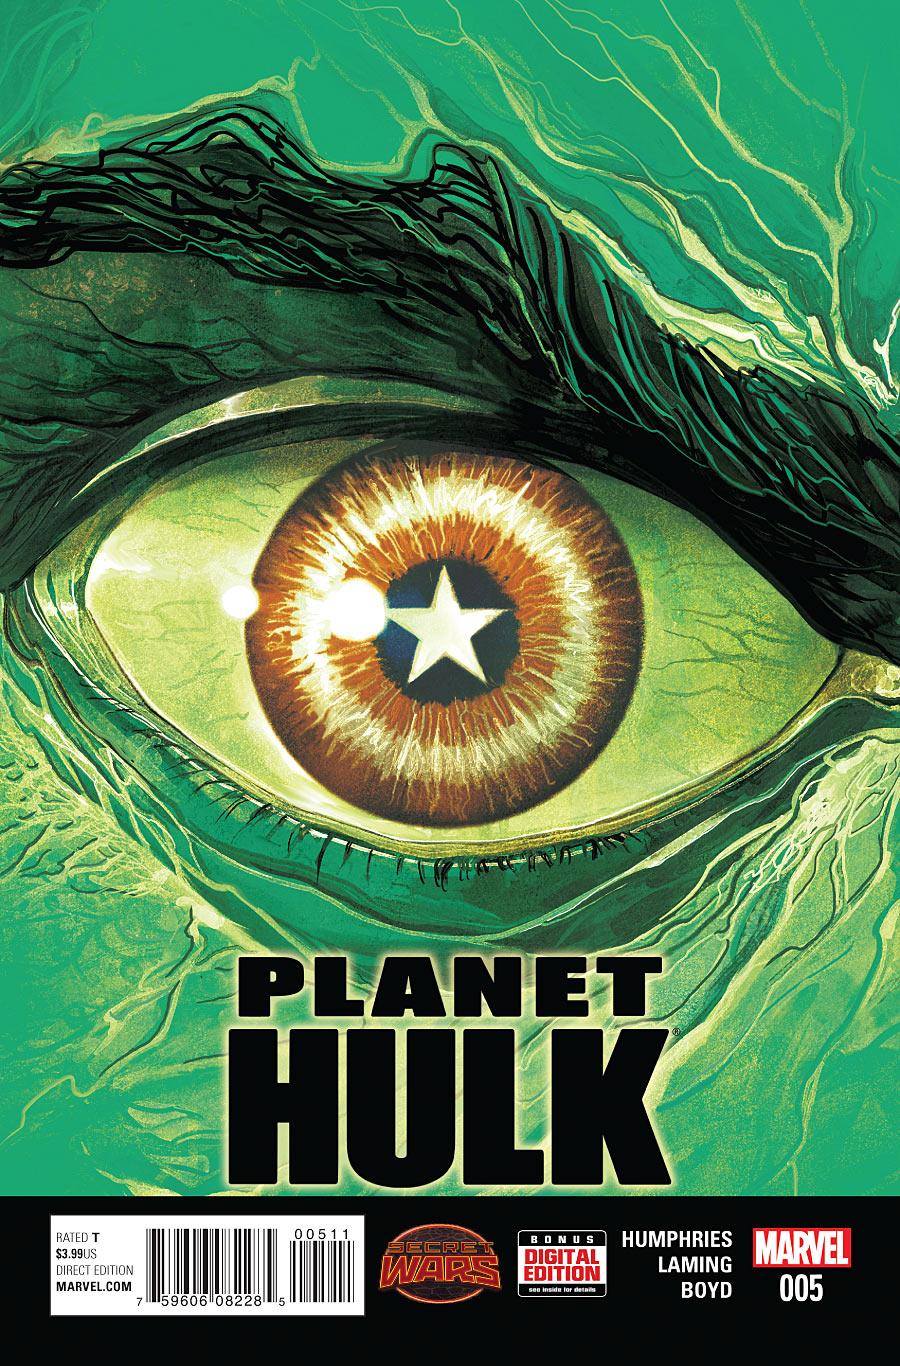 Planet Hulk #5